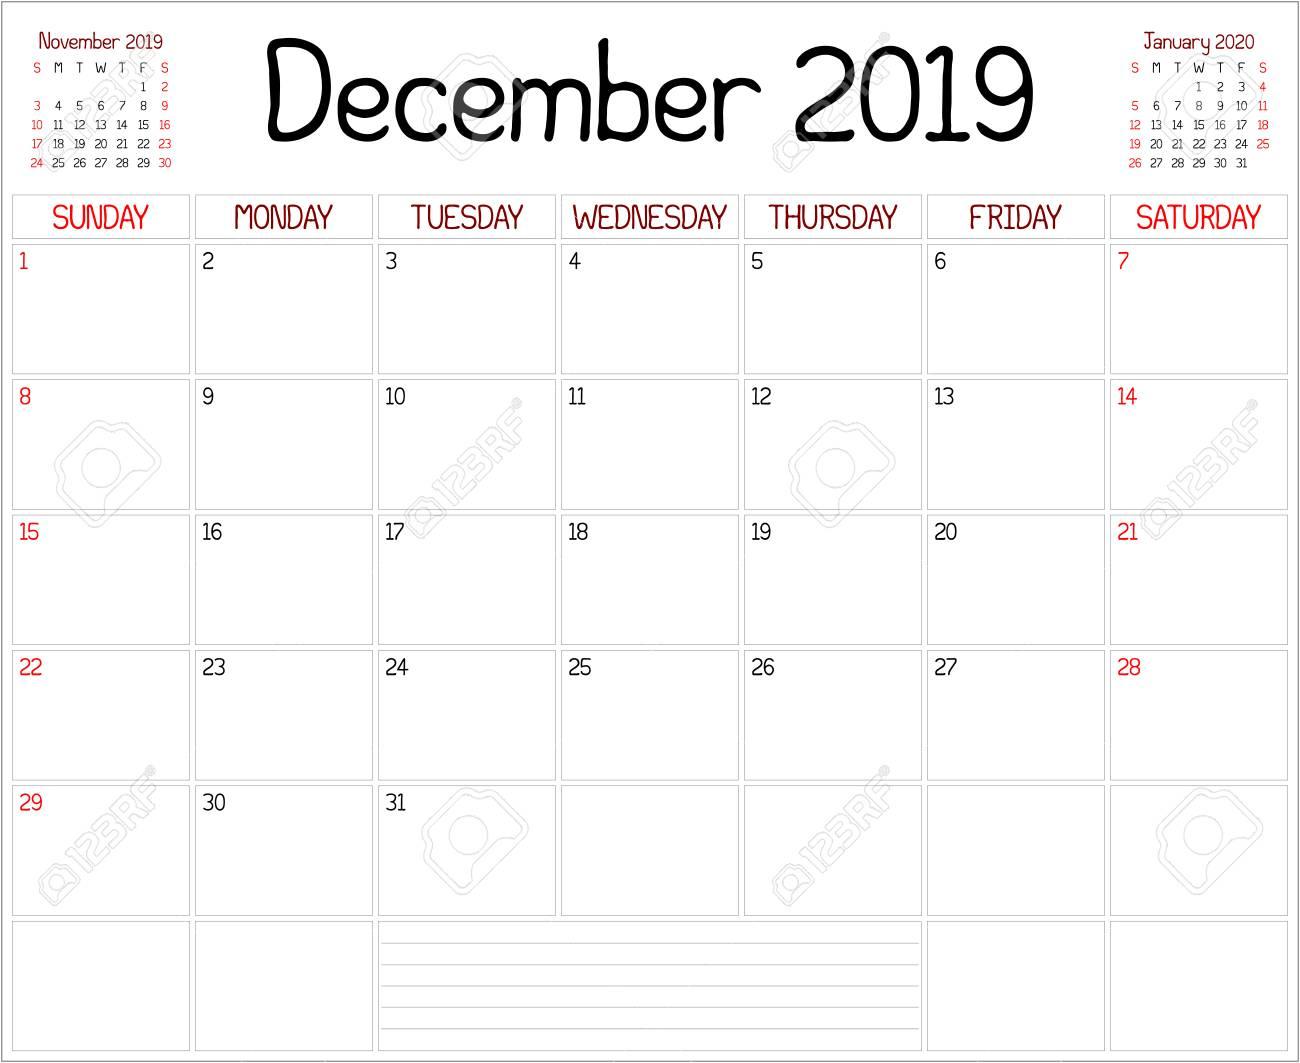 Calendar December 2019 January 2020.Year 2019 December Planner A Monthly Planner Calendar For December